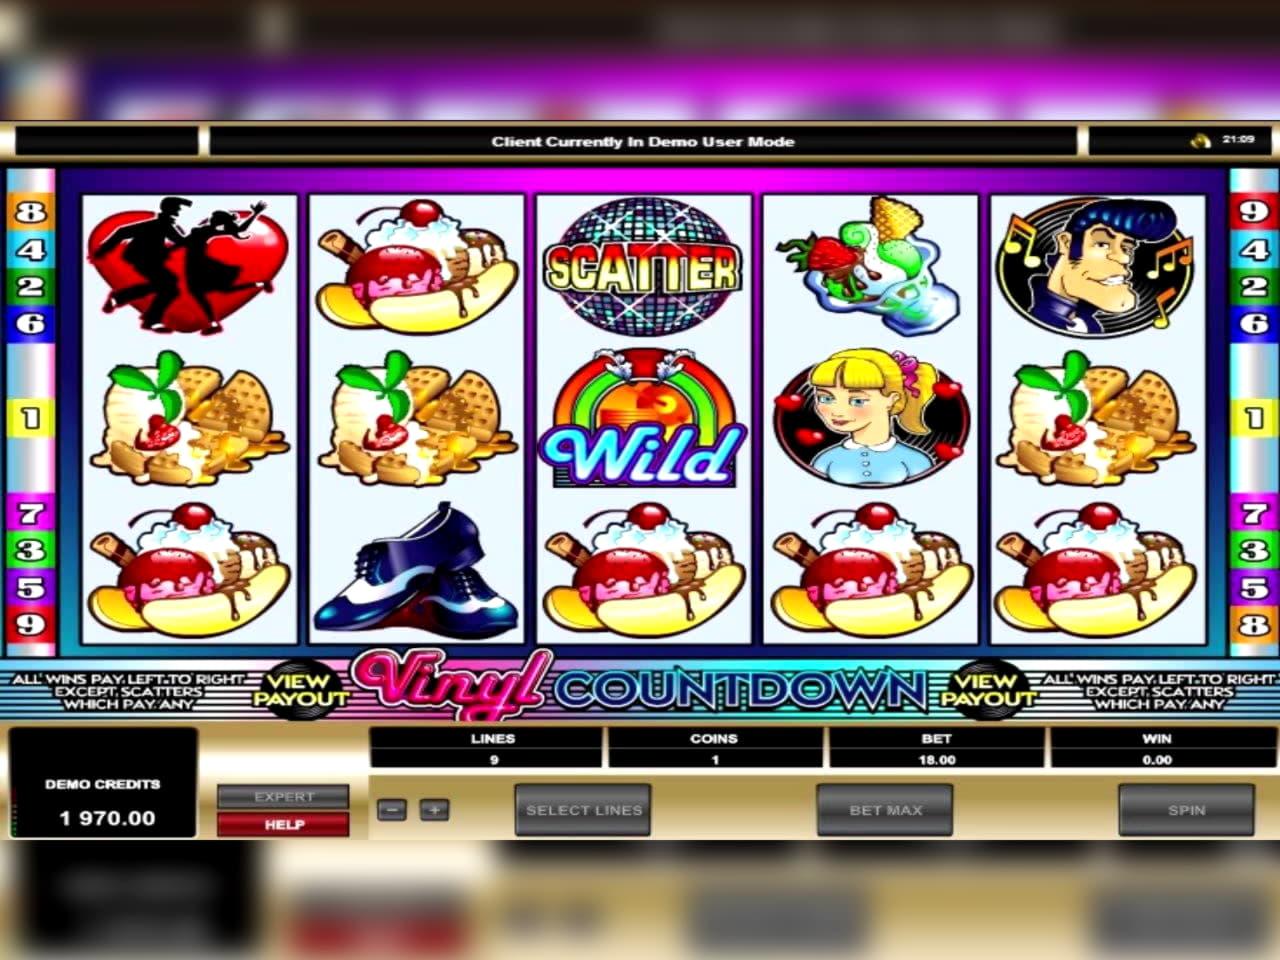 285% Match at a casino at Casino Las Vegas